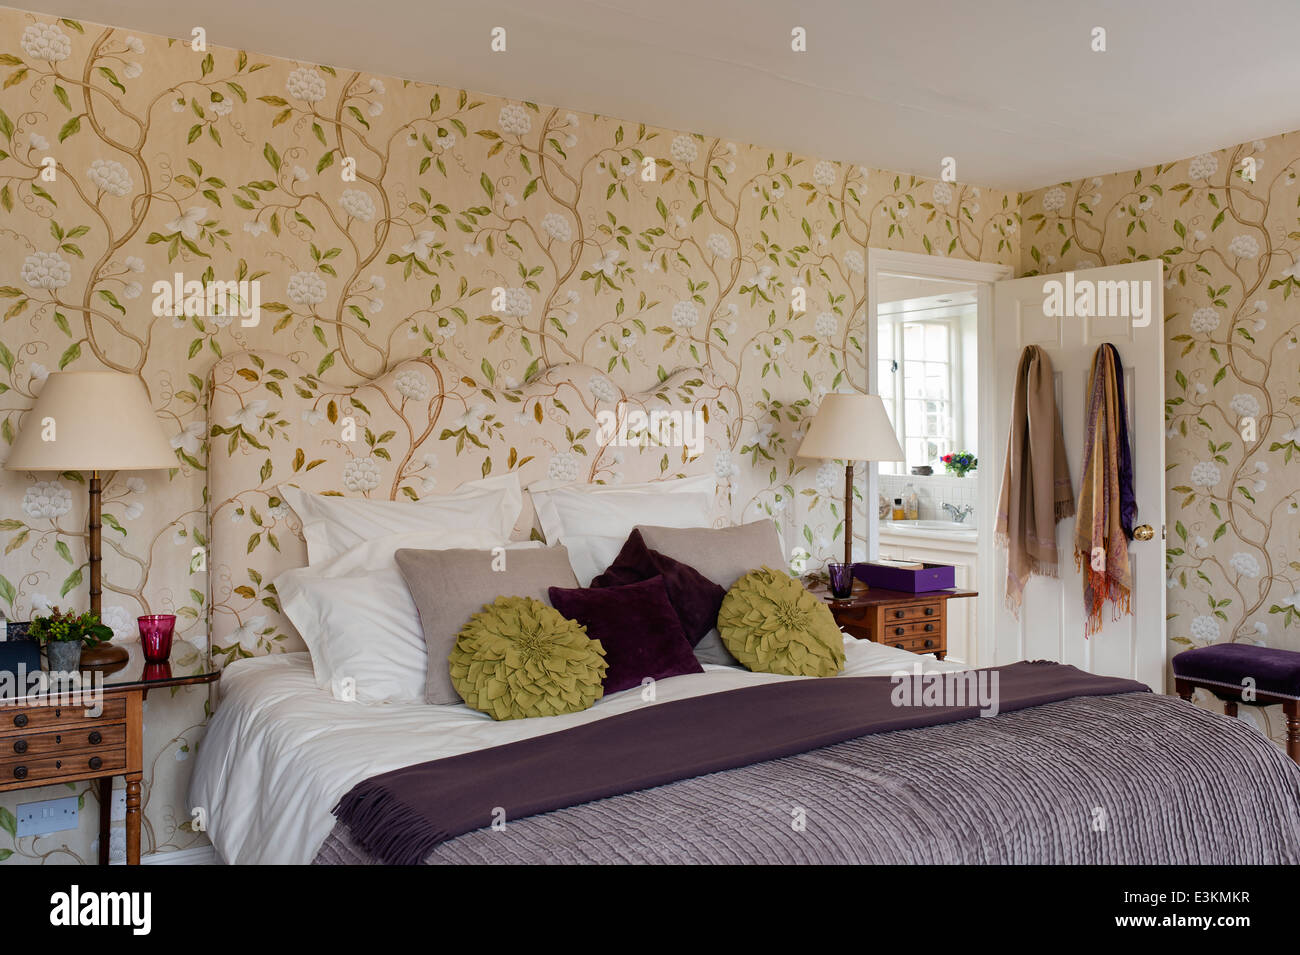 Papered Stockfotos & Papered Bilder - Alamy